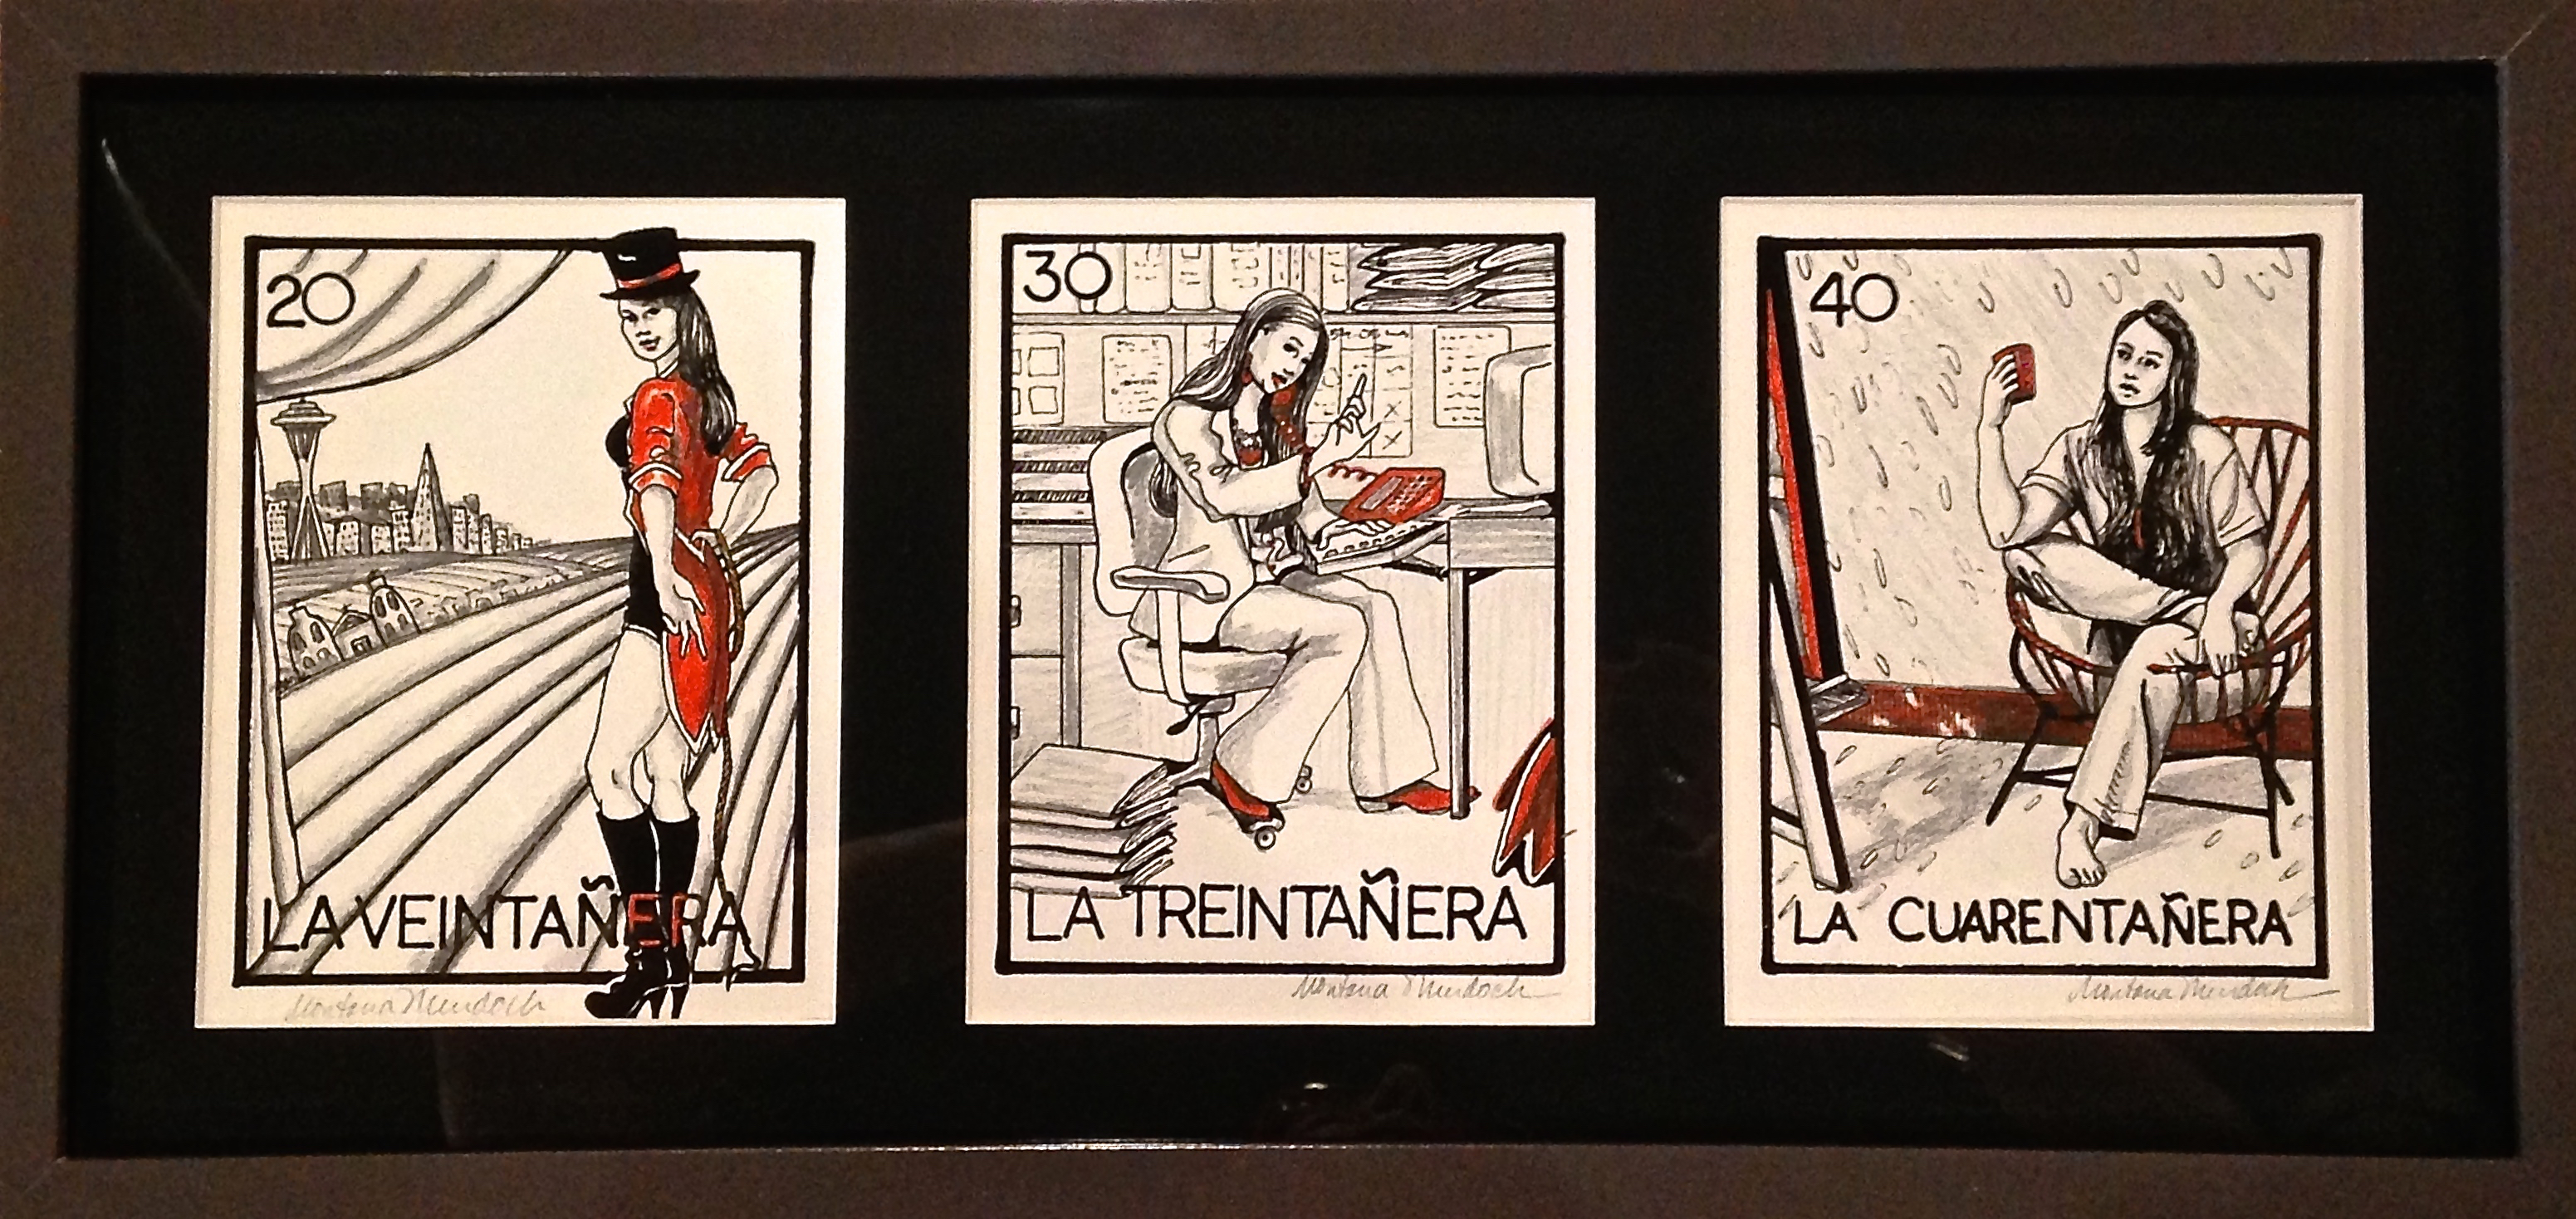 Las Veint-Treint-Cuarentaneras